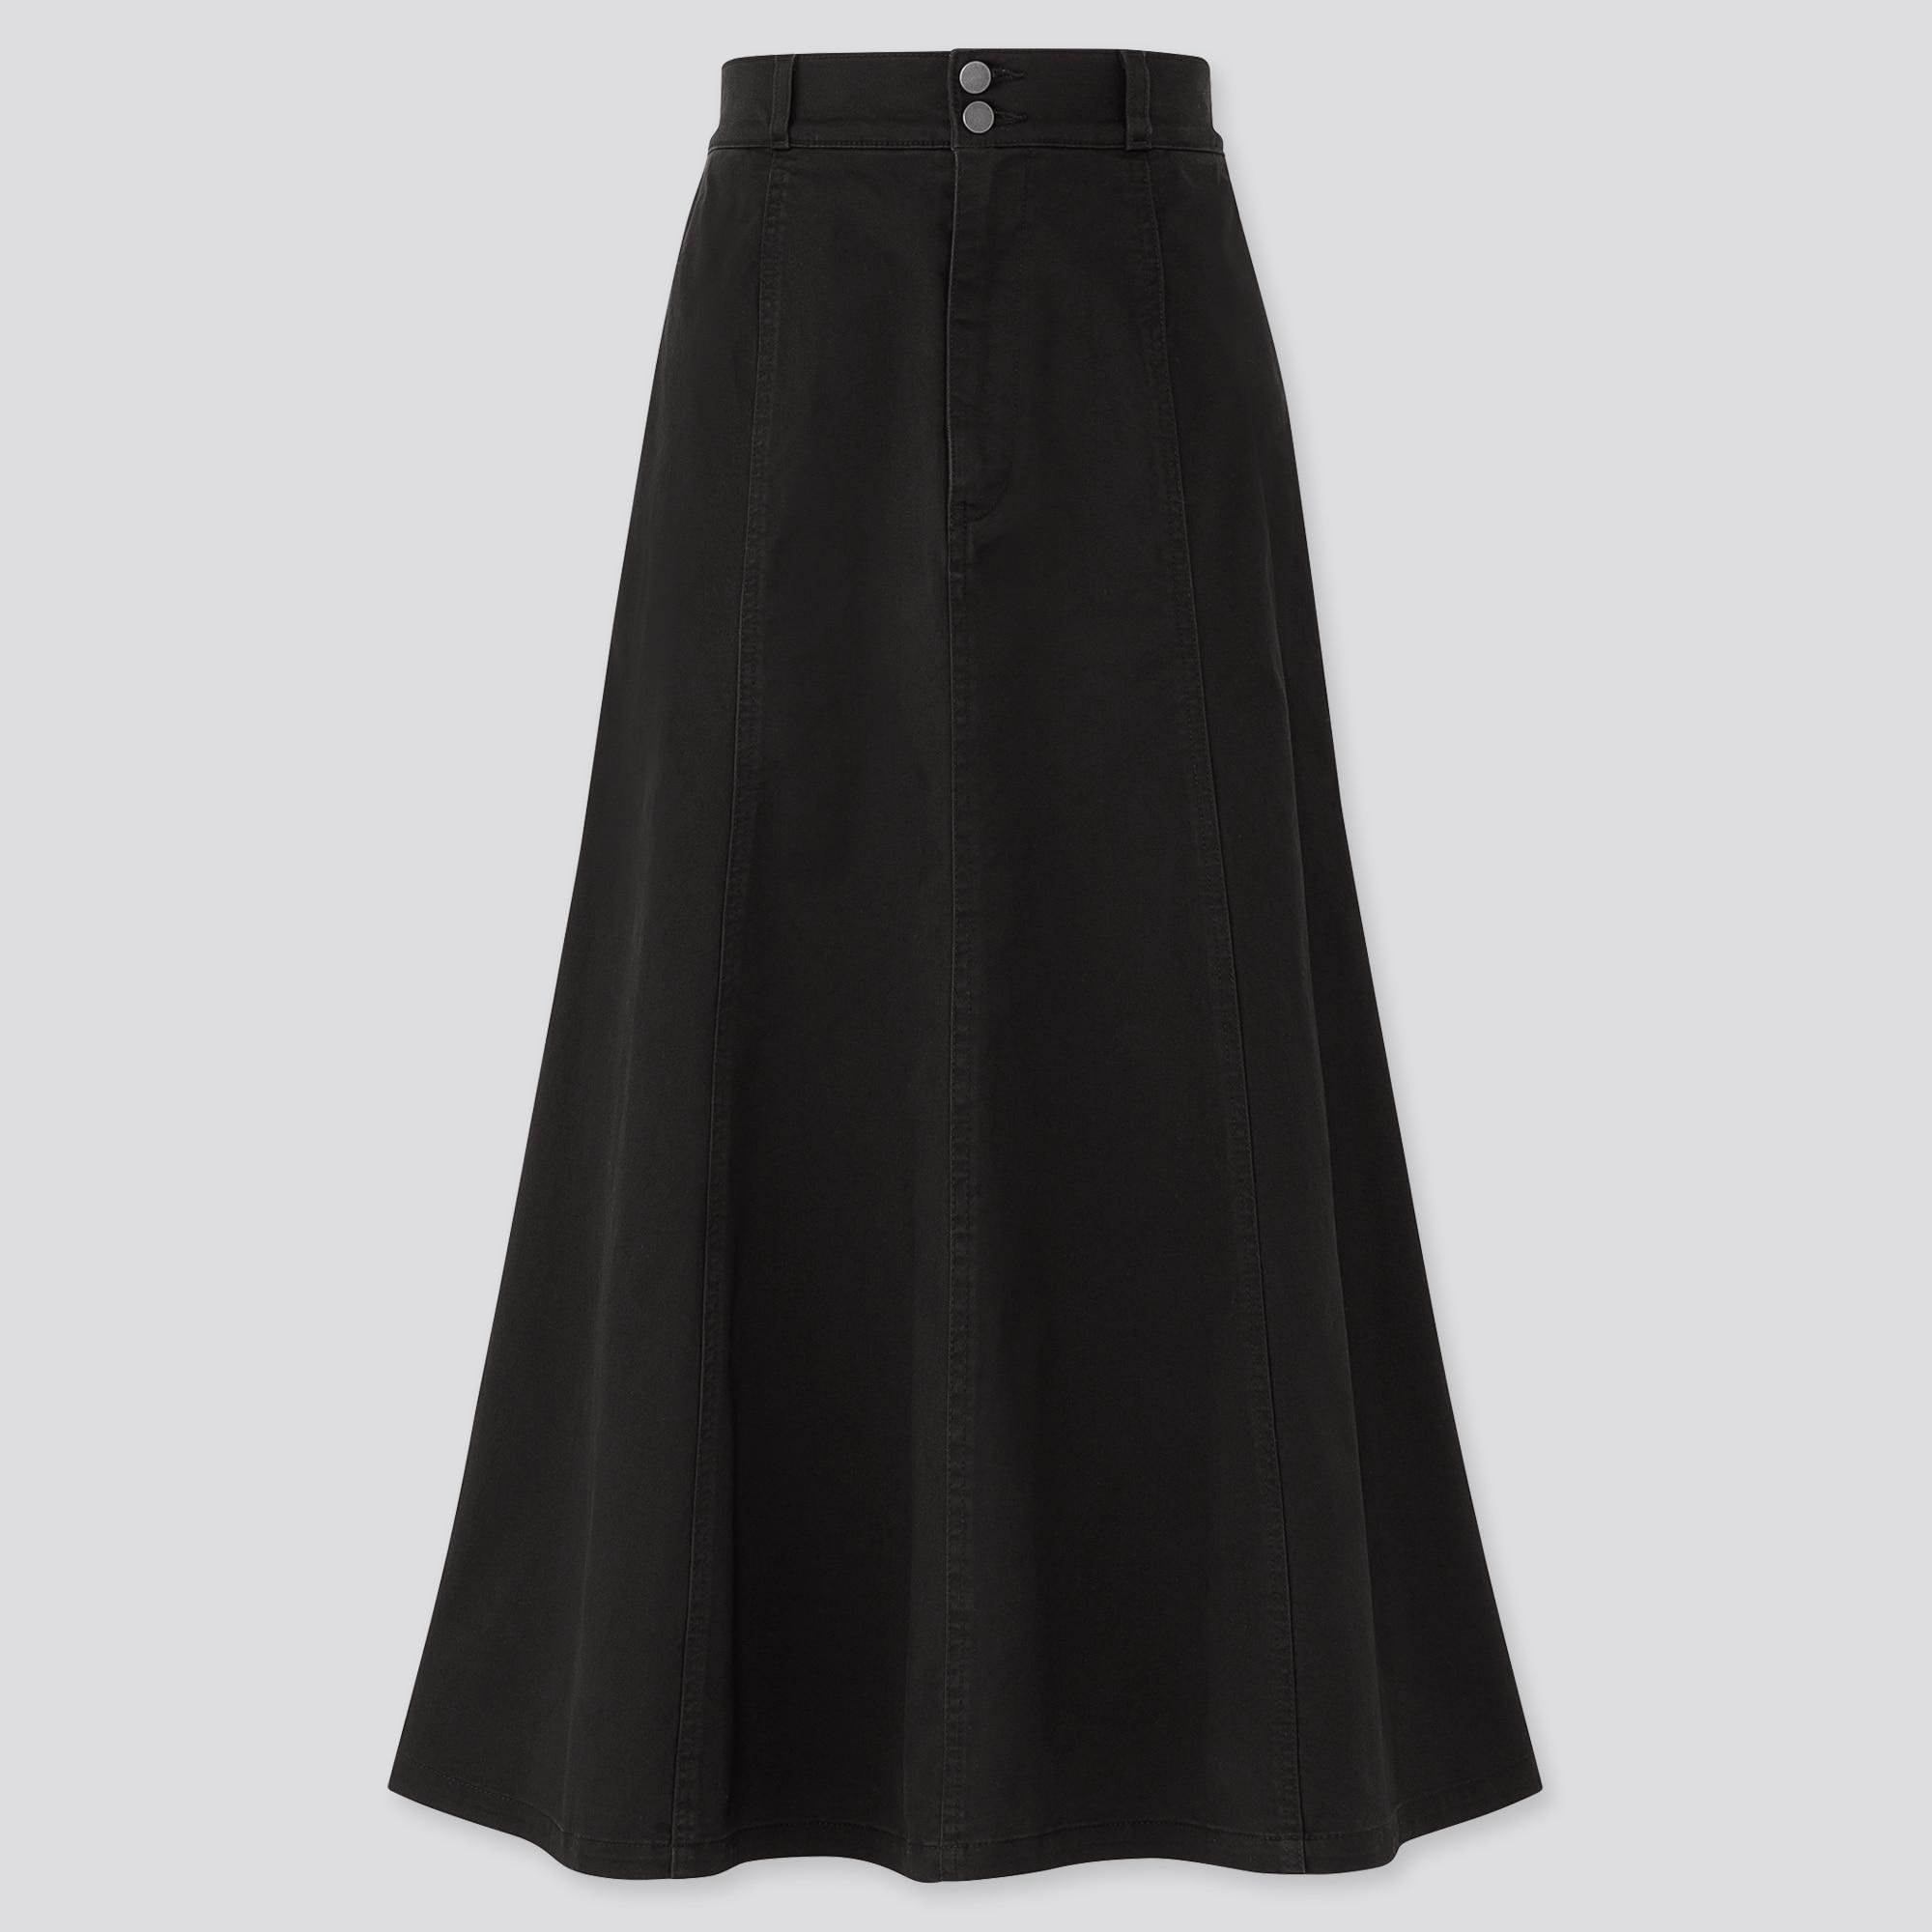 Women Cotton High Waisted Mermaid Maxi Skirt